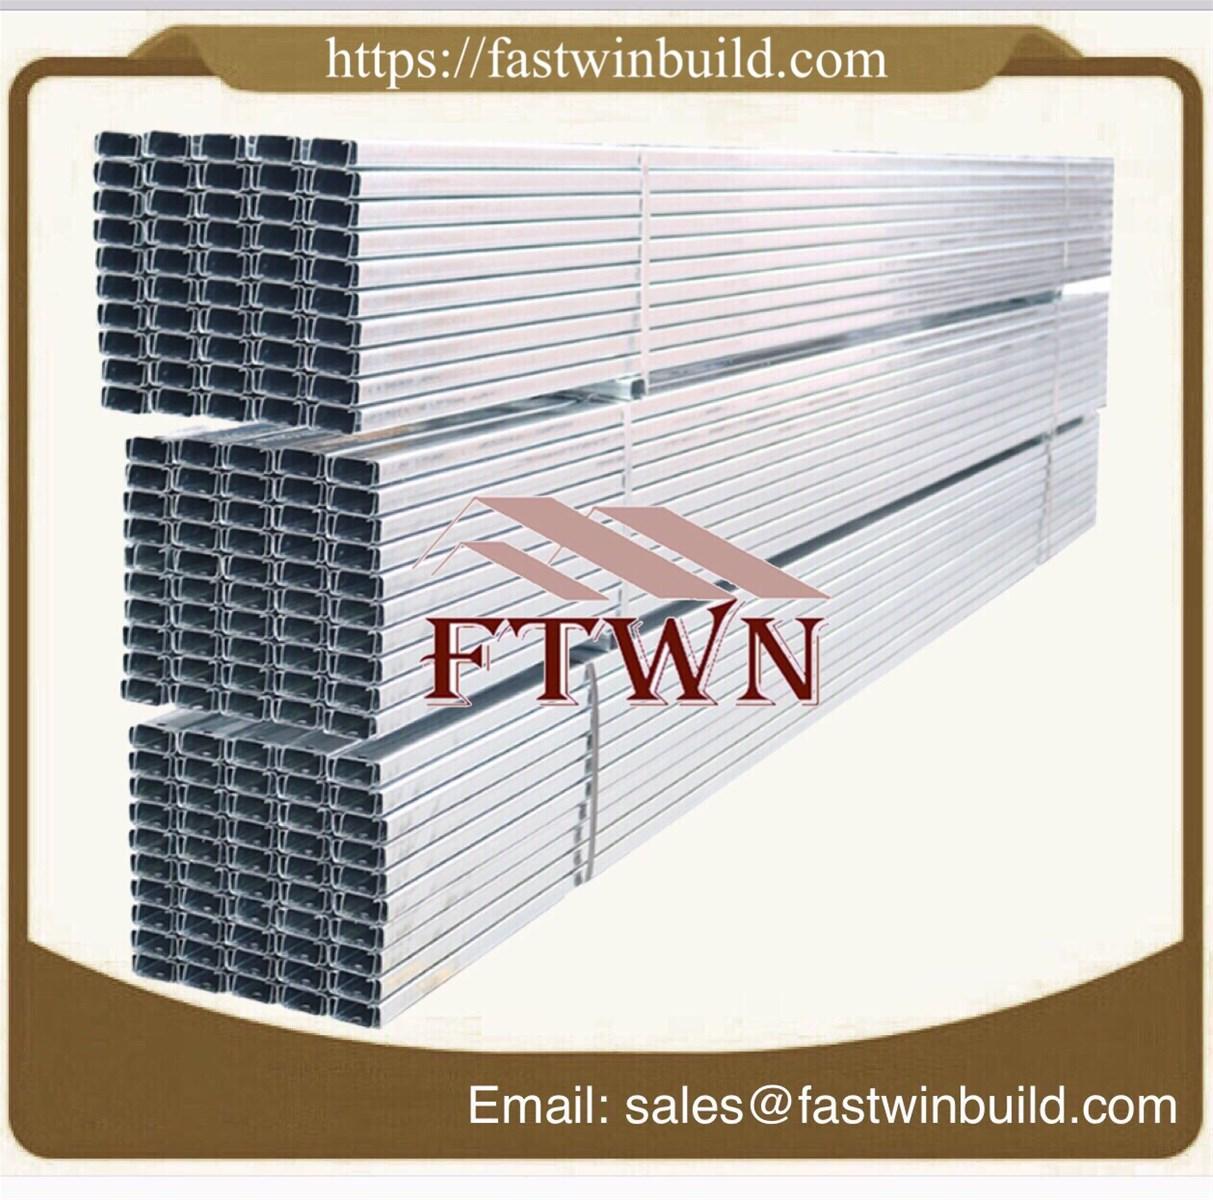 Dywall C Channel Galvanized Light Steel Keel Metal Profiles Frame Stud Track